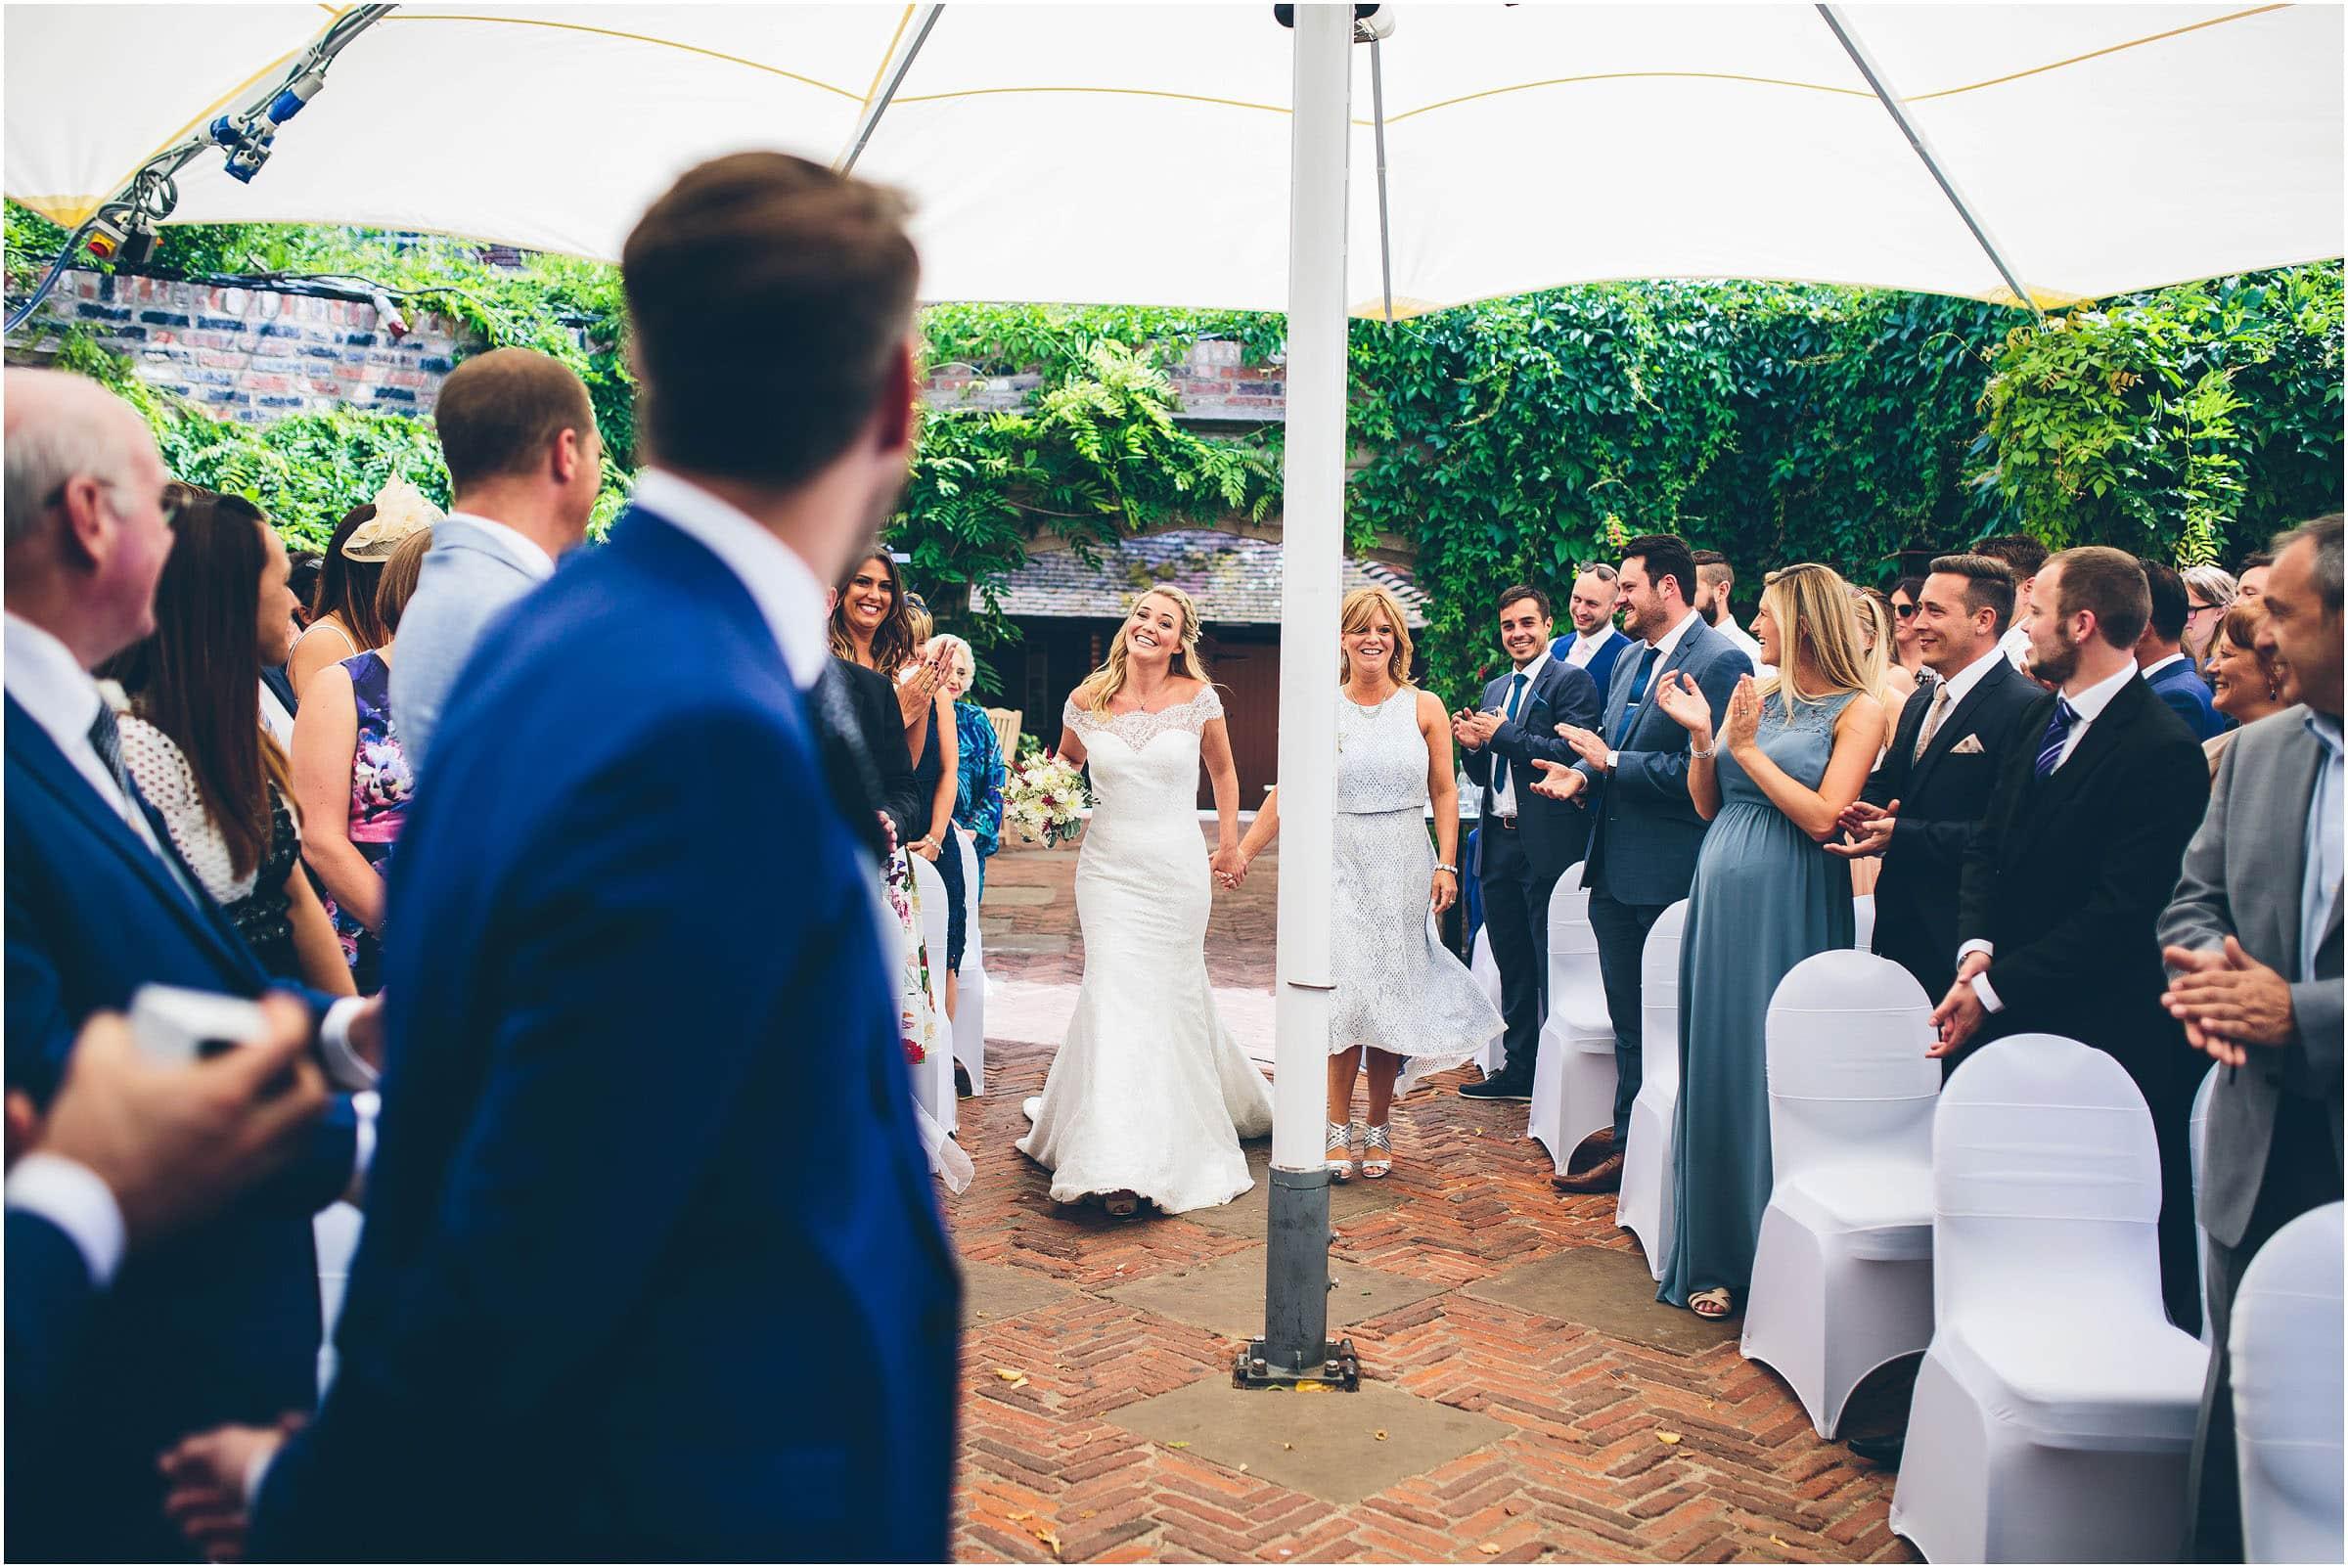 Kensington_Roof_Gardens_Wedding_Photography_0026